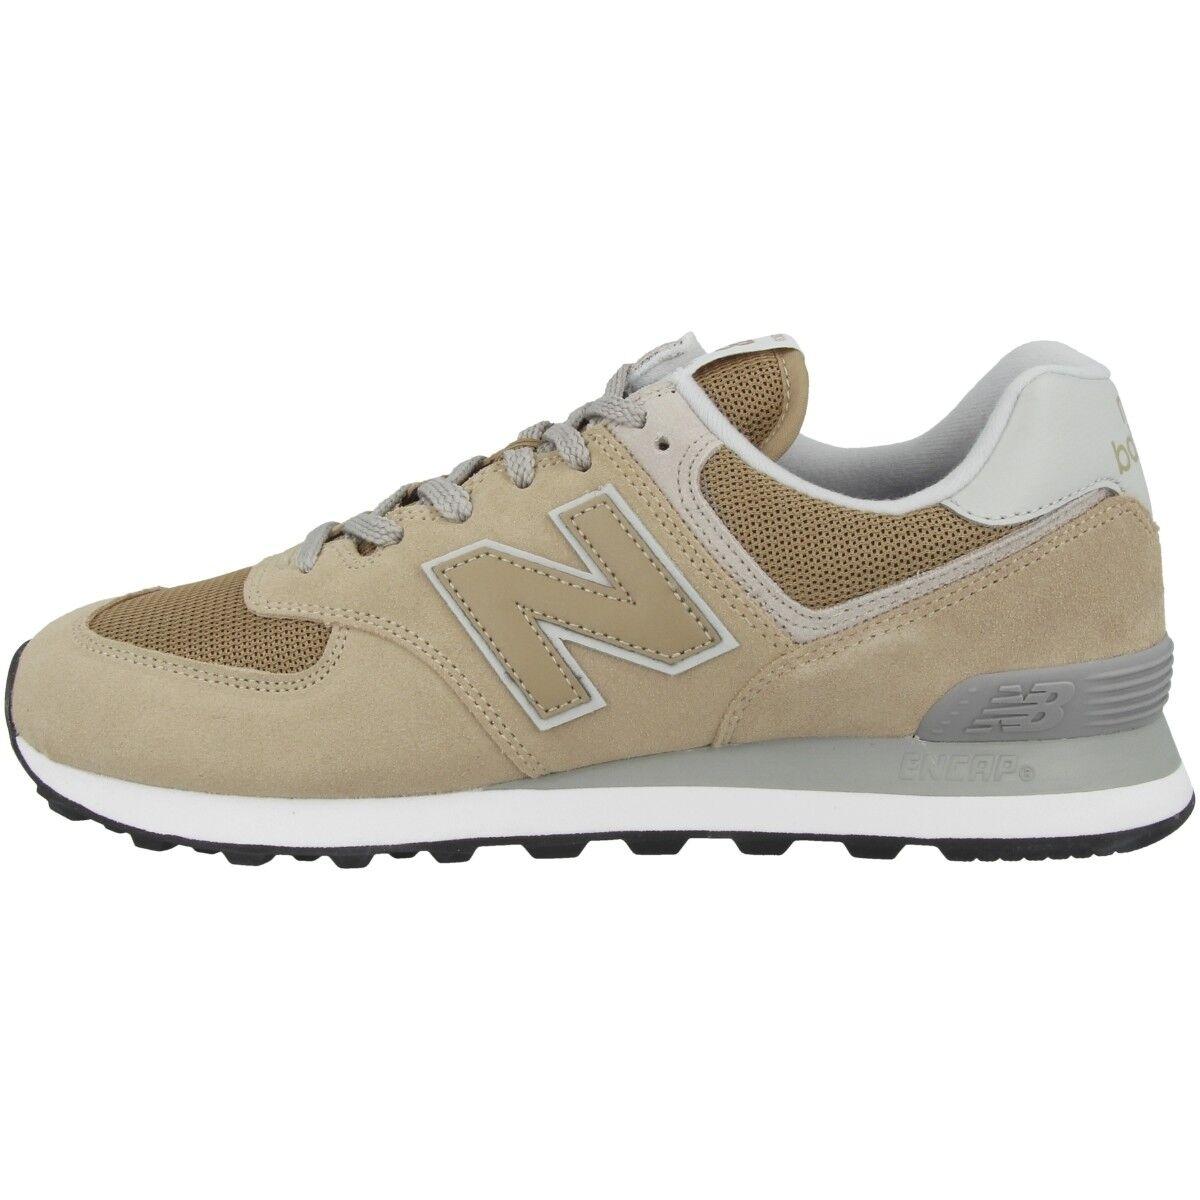 Zapatos promocionales para hombres y mujeres New Balance ML 574 EBE Schuhe Freizeit Sport Sneaker Turnschuhe hemp ML574EBE